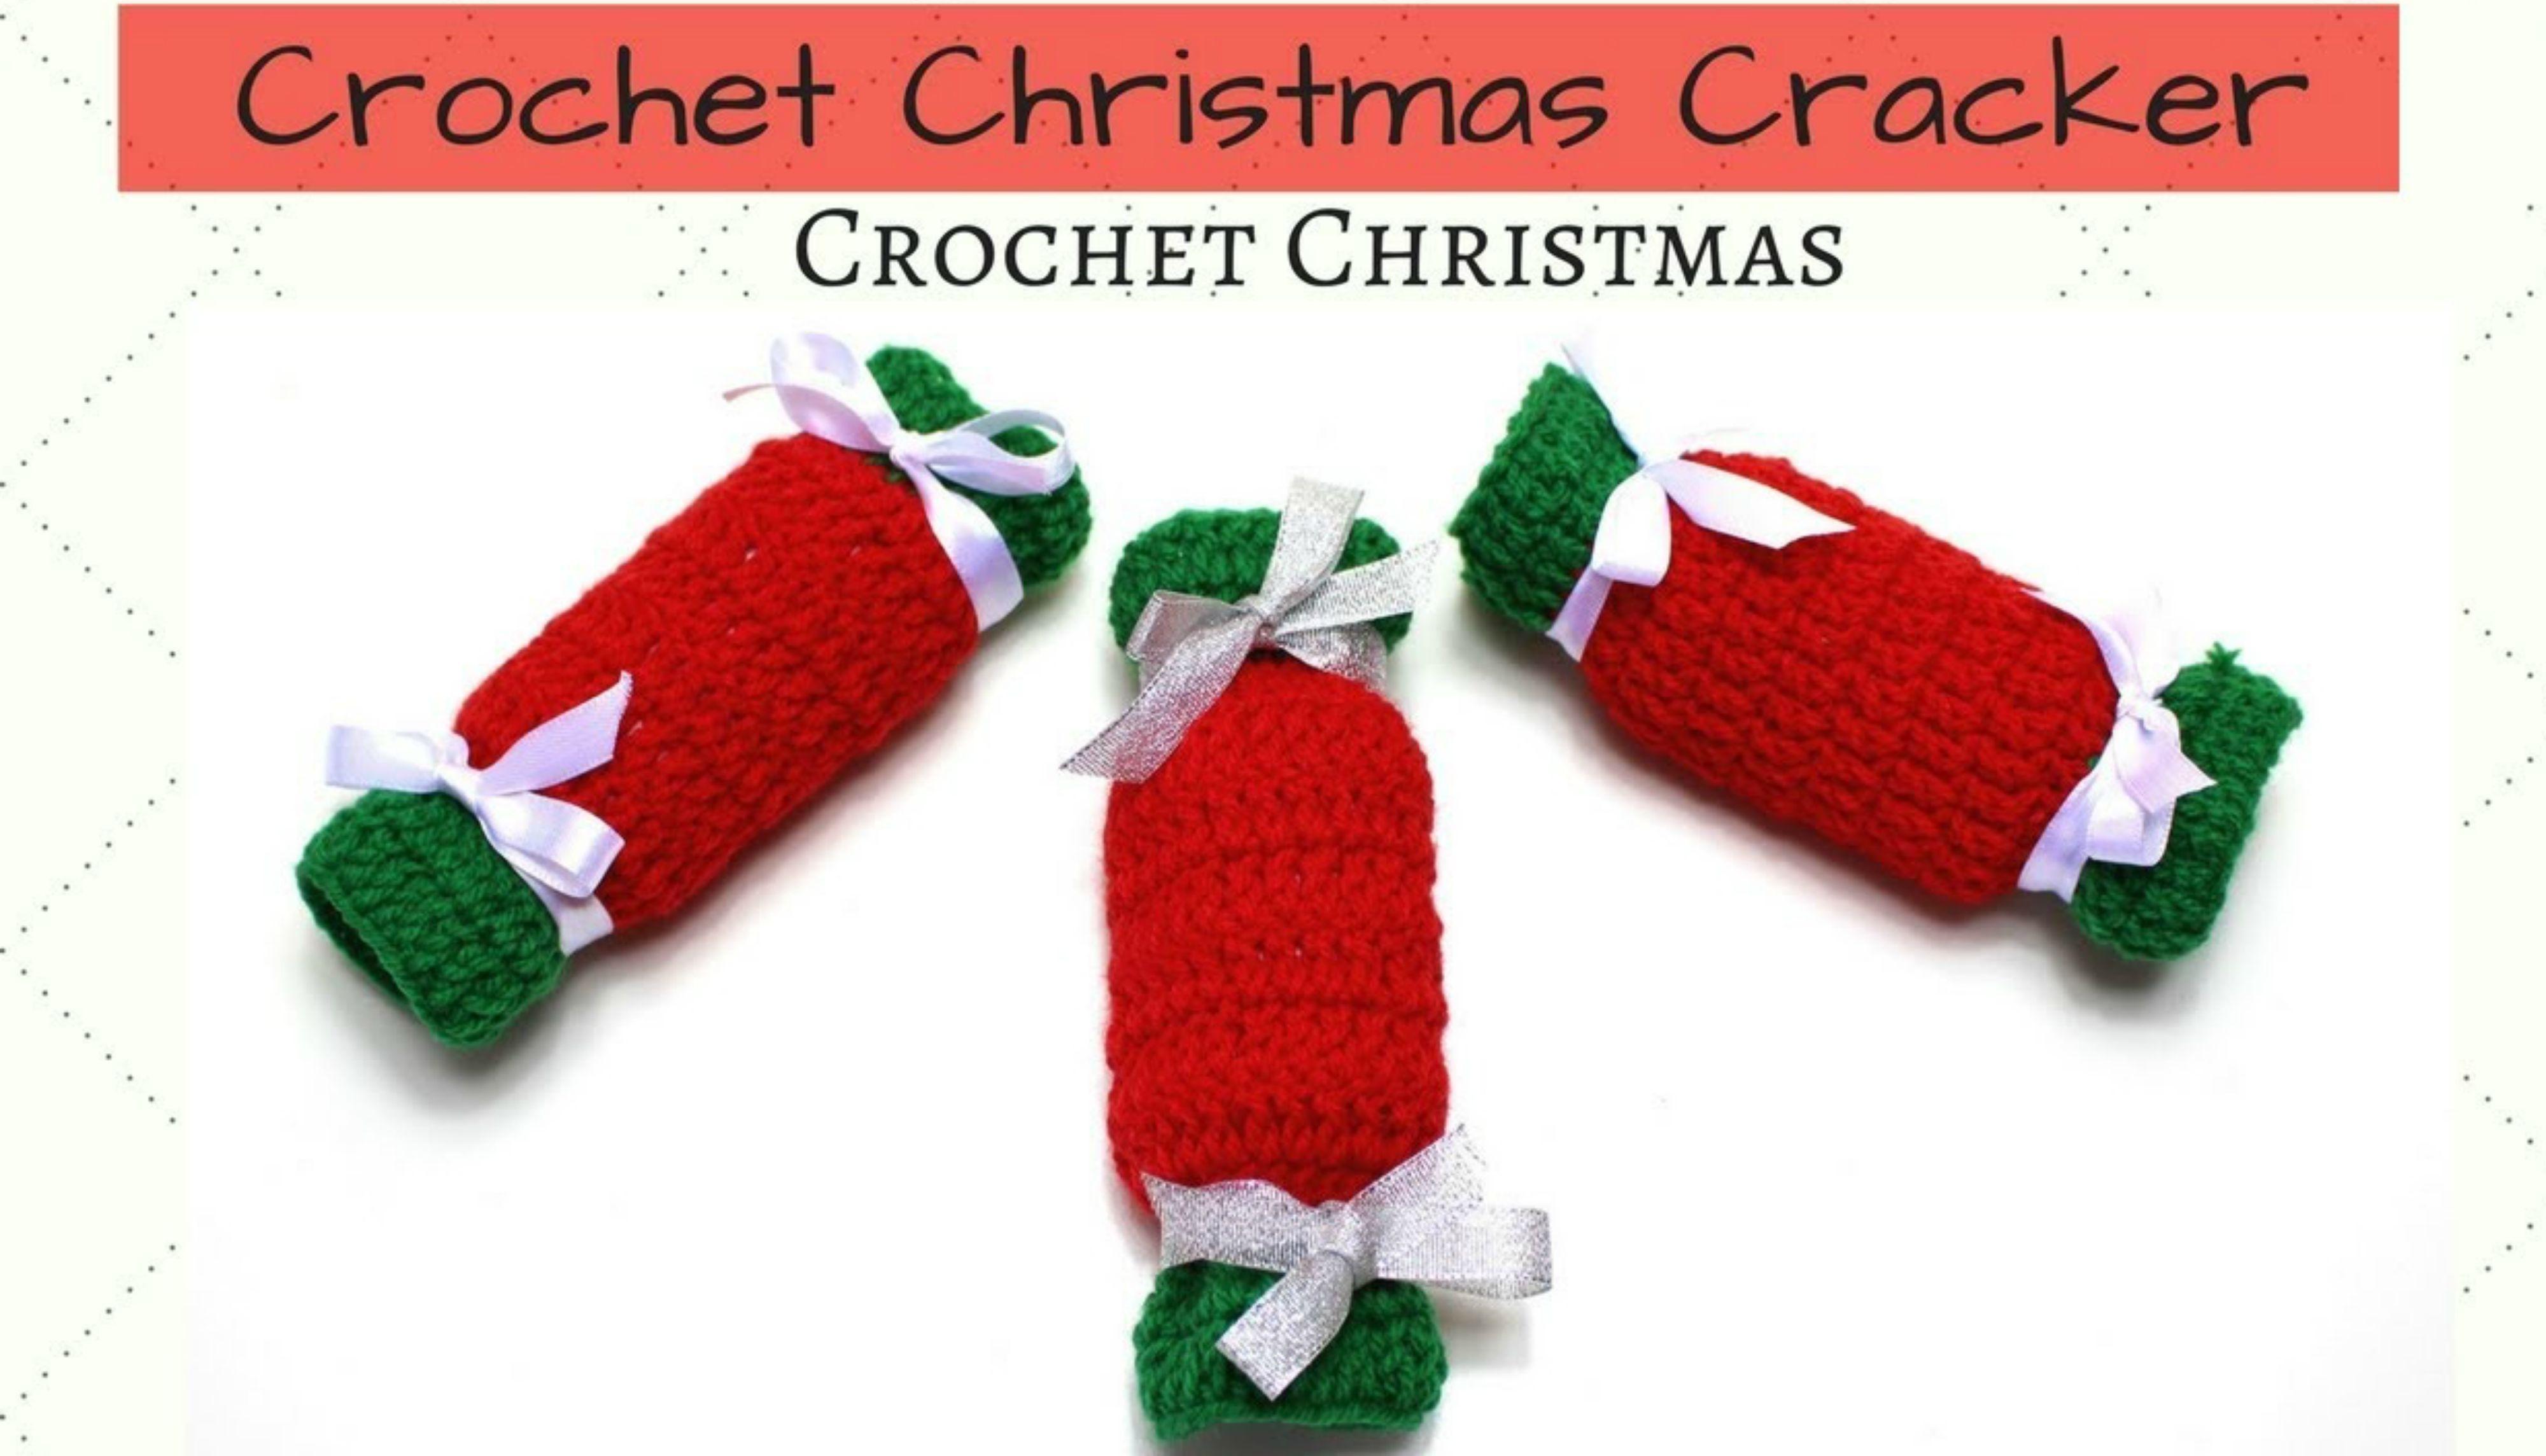 Learn To Crochet A Christmas Cracker